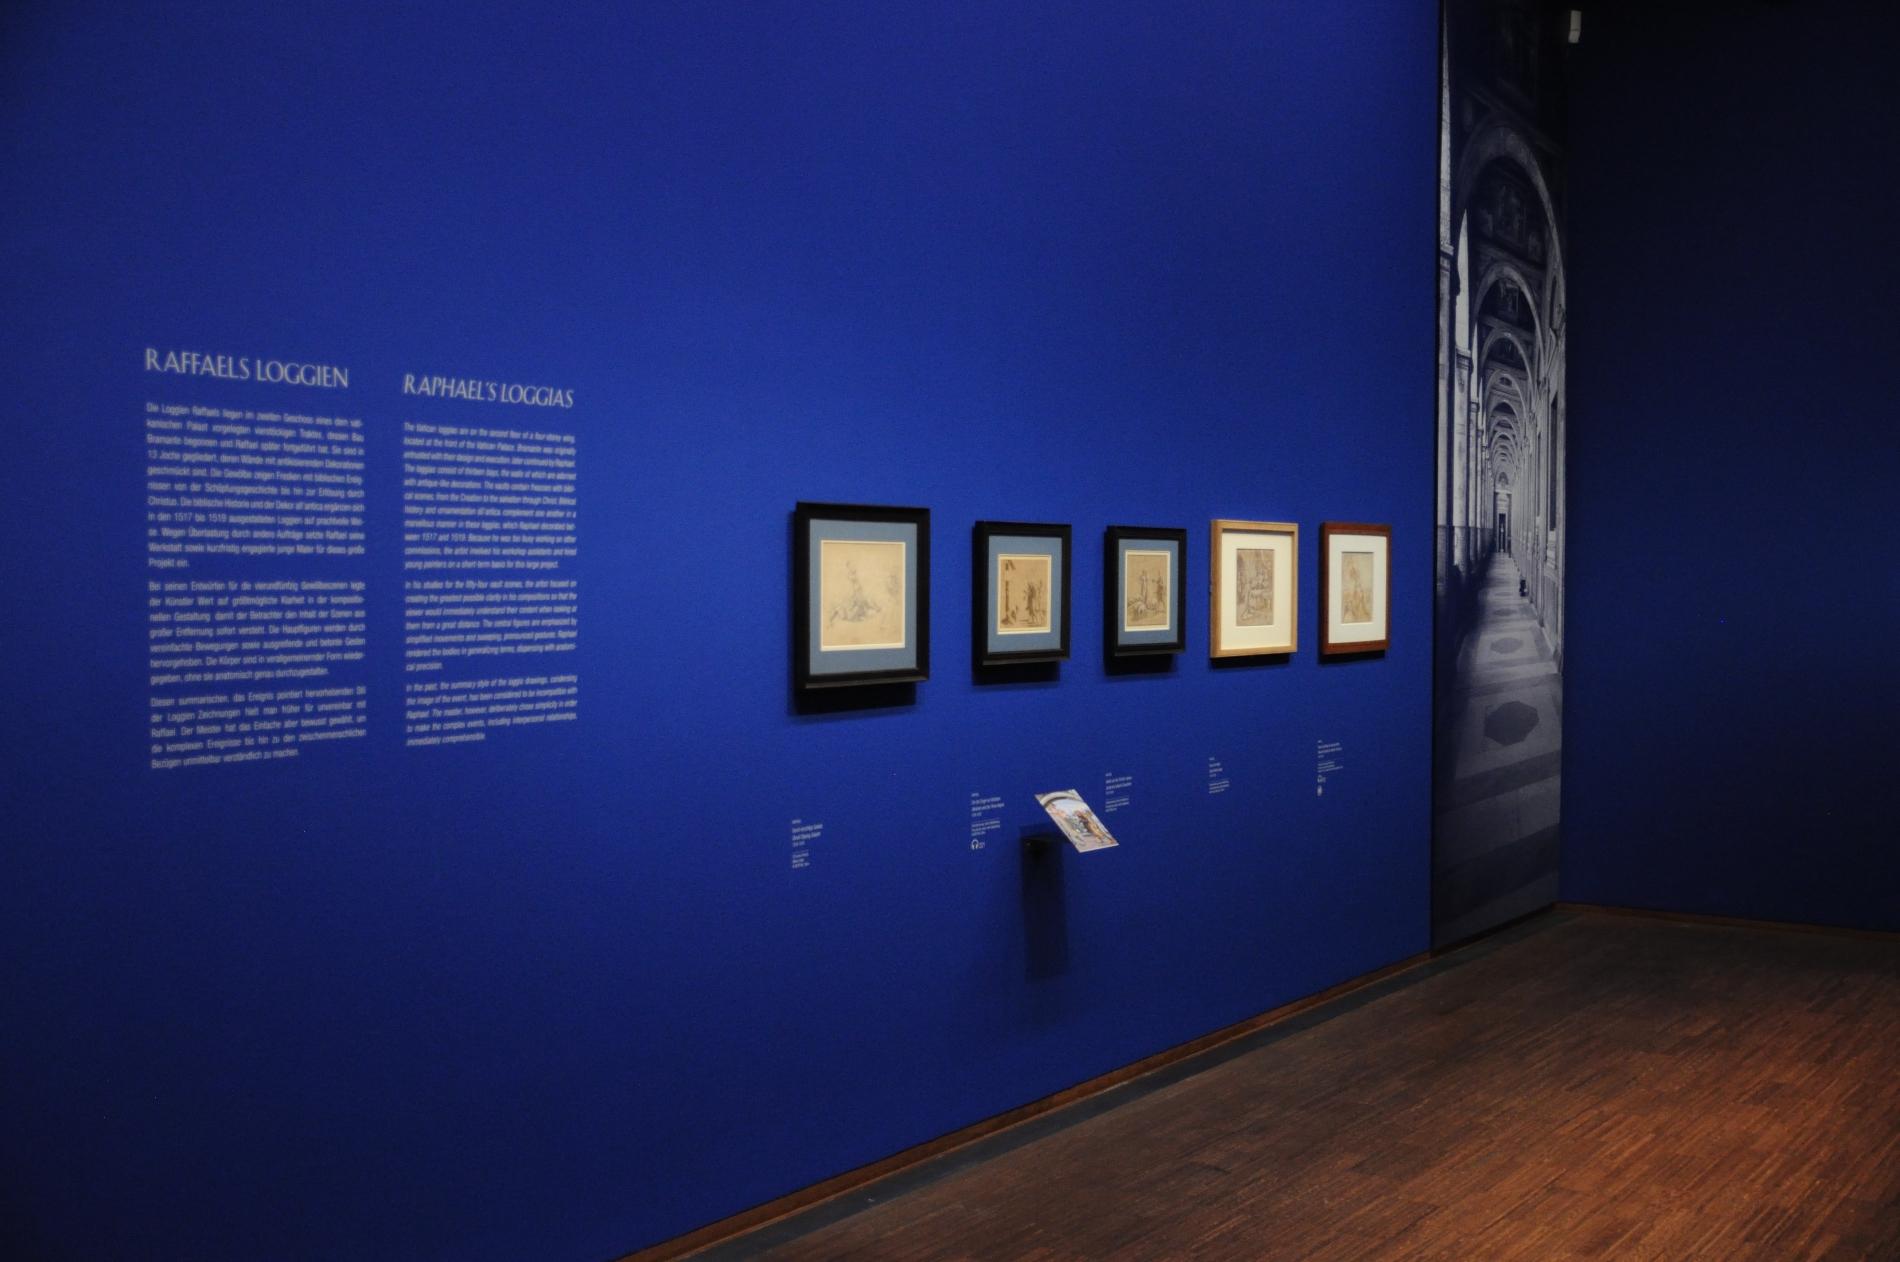 Albertina, Raphael exhibition